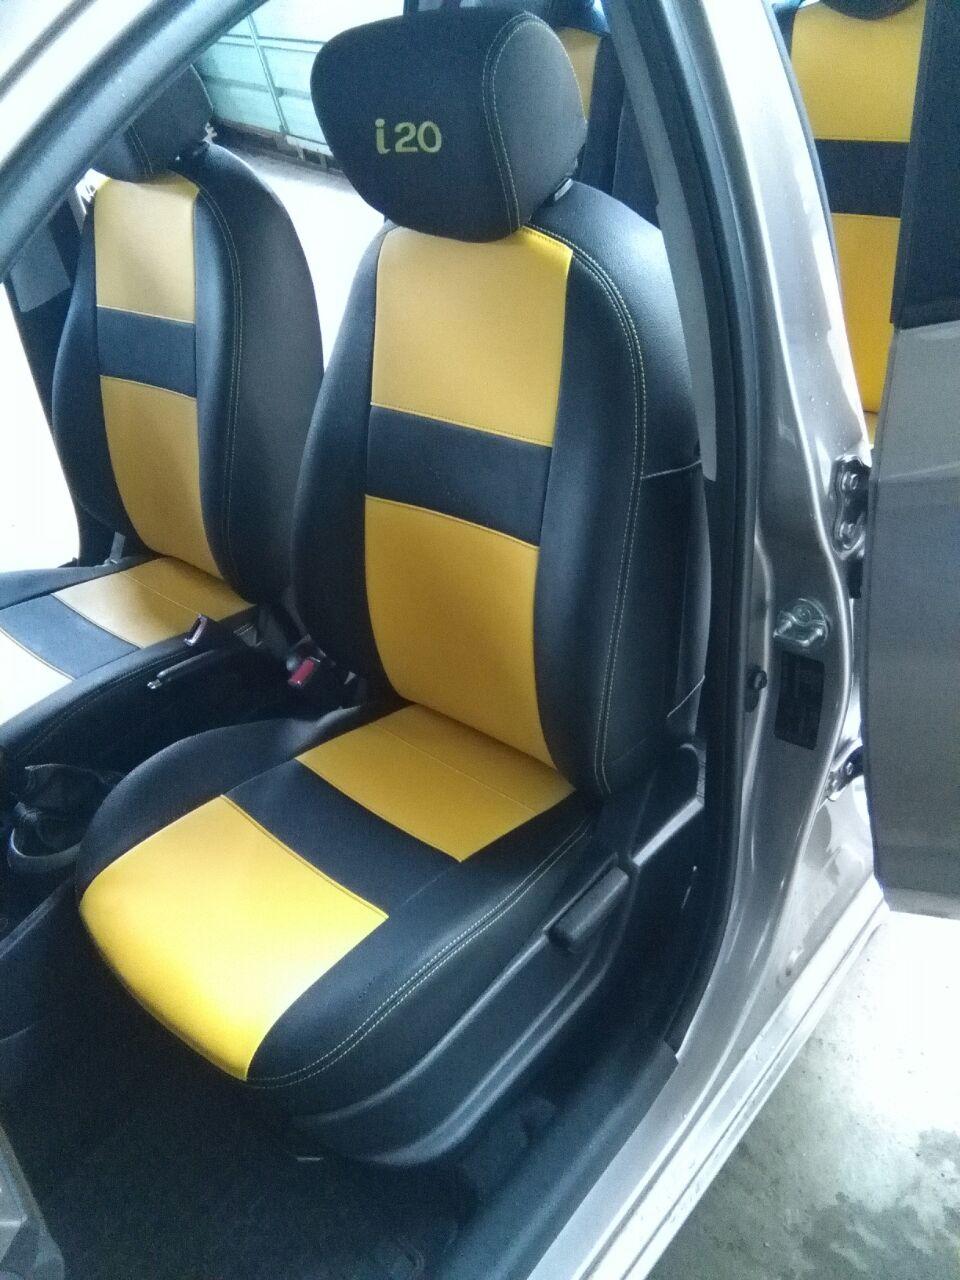 Hyundai I20 SEAT COVER